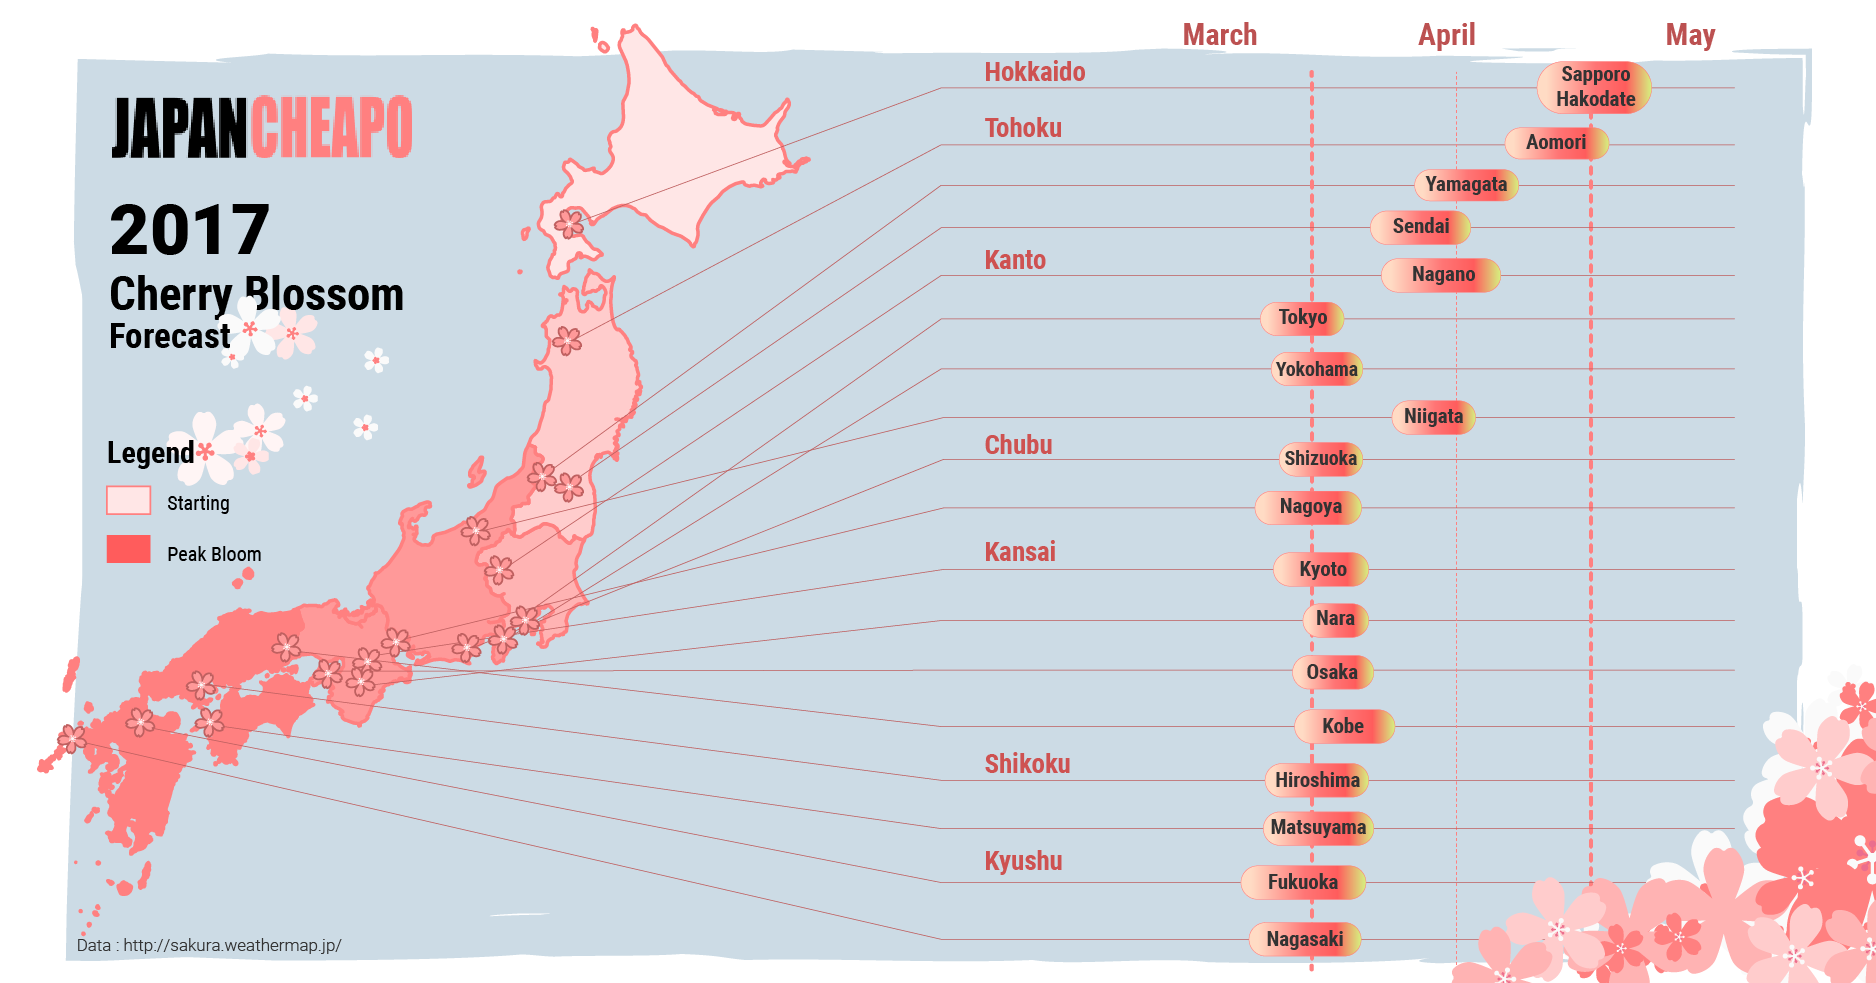 Japan Cherry Blossom Forecast By Major City Japan Cheapo - Japan map 2017